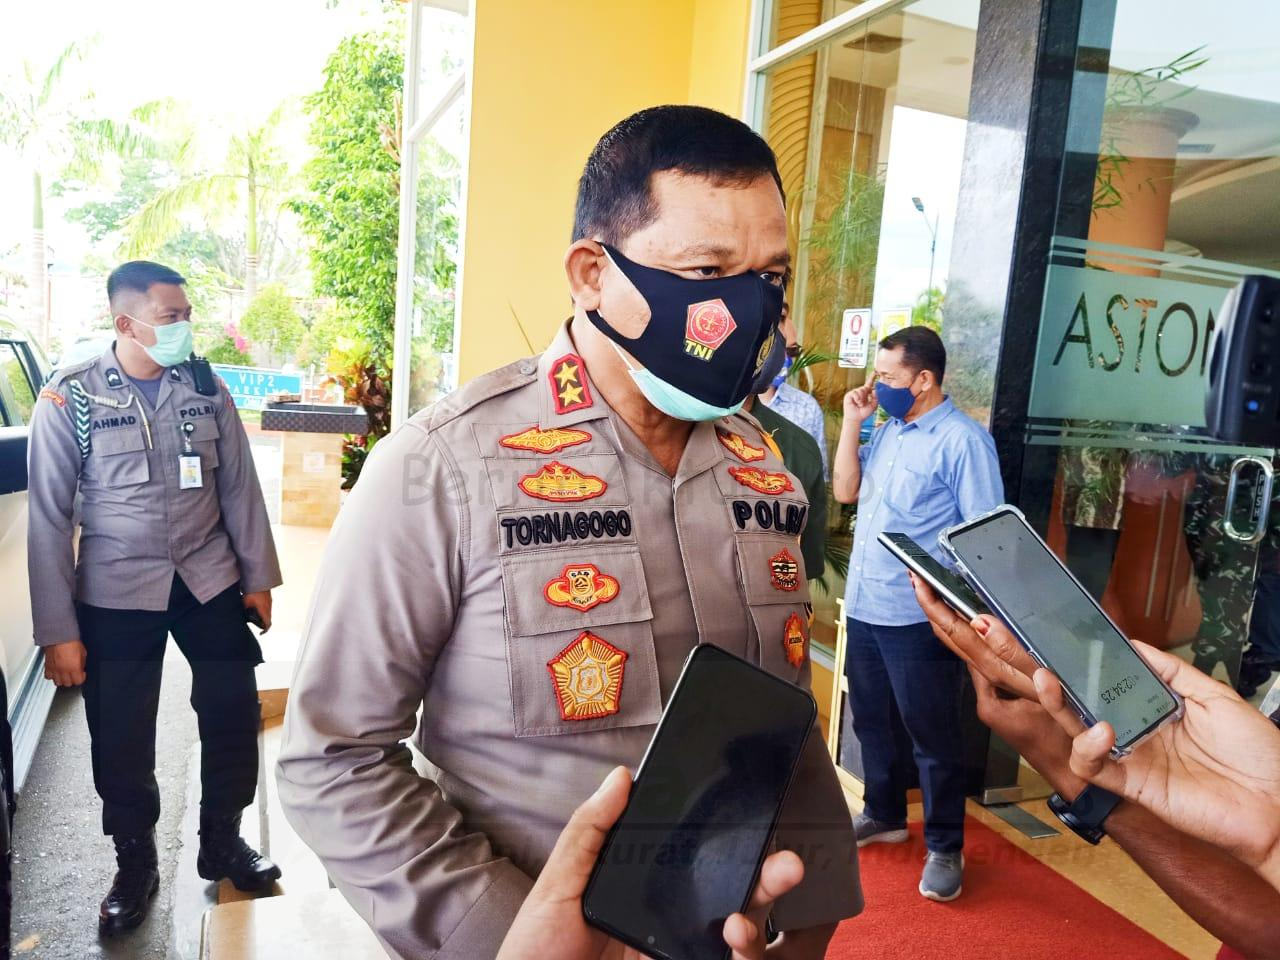 Kapolda PB: Warga Yang Tidak Pakai Masker Dapat Sanksi Baca Pancasila 1 IMG 20200926 WA0032